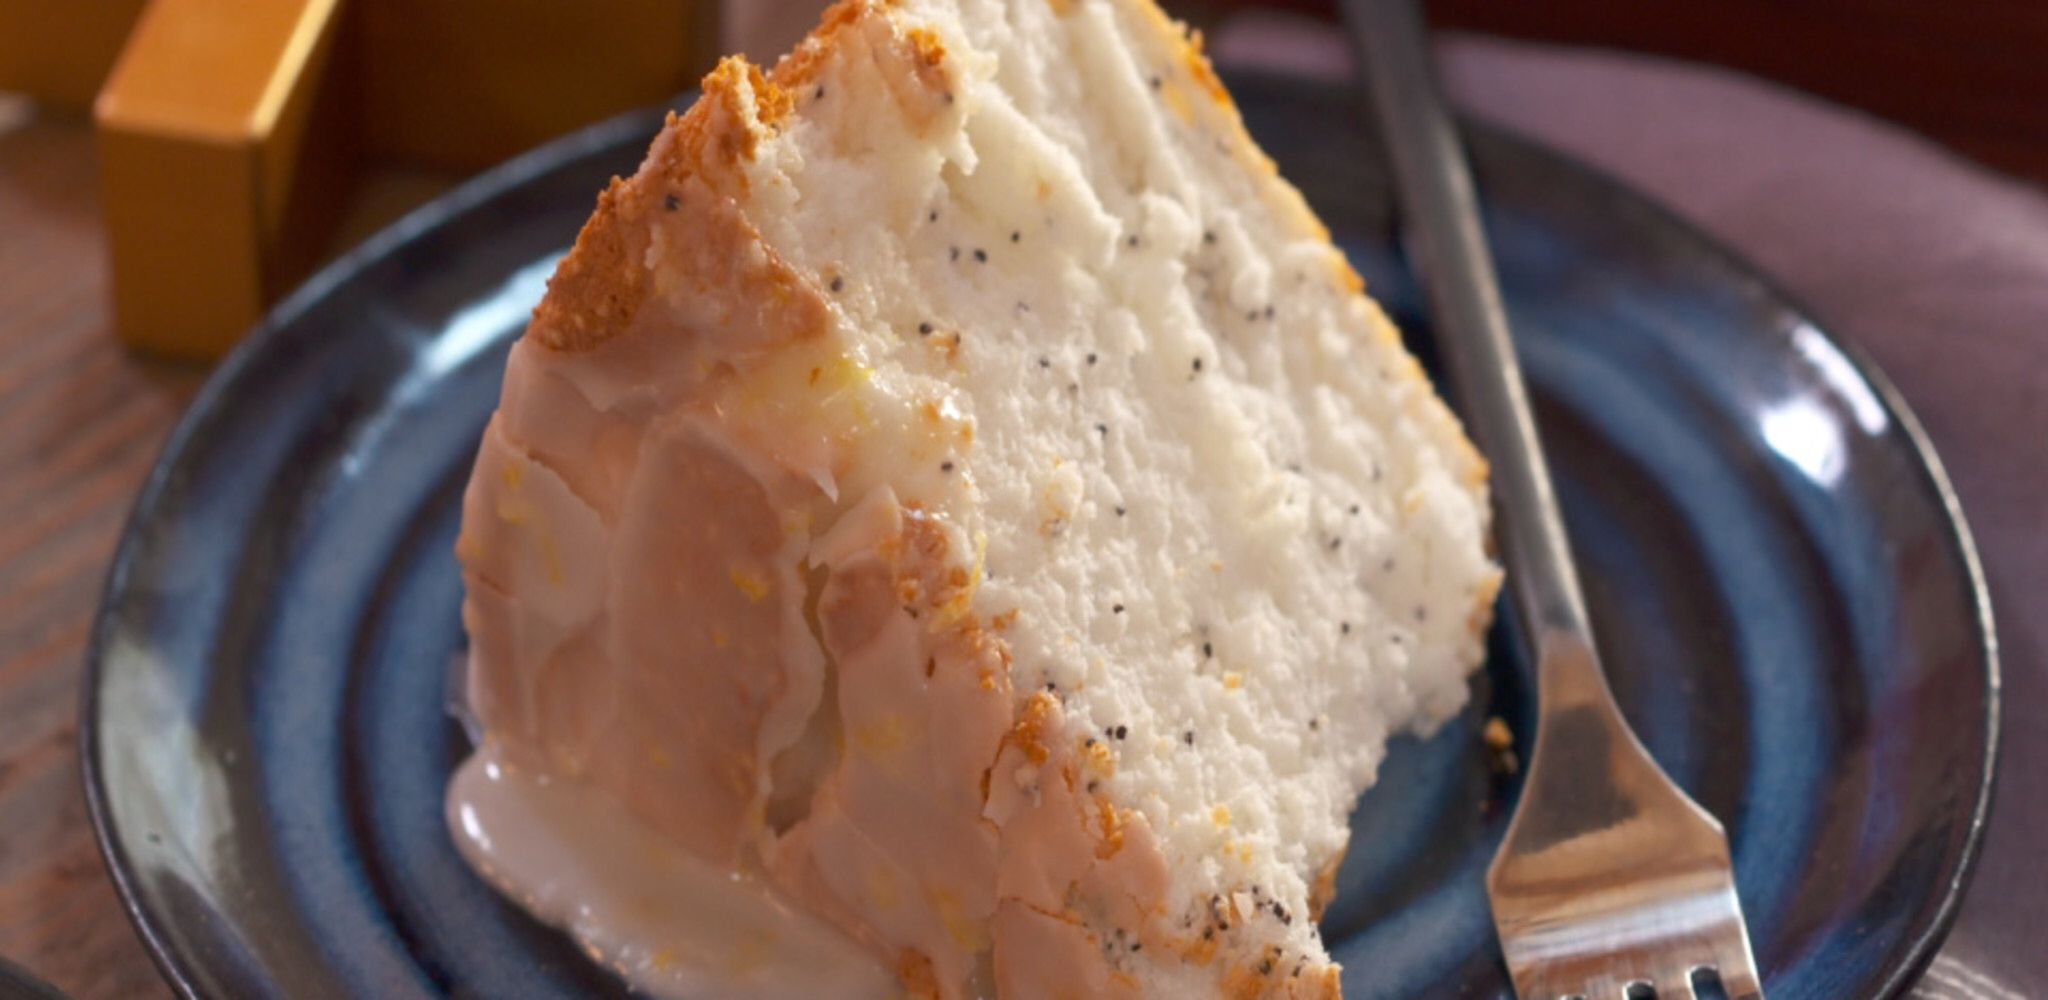 Poppy Seed And Lemon Angel Food Cake Recipe In 2020 Cake